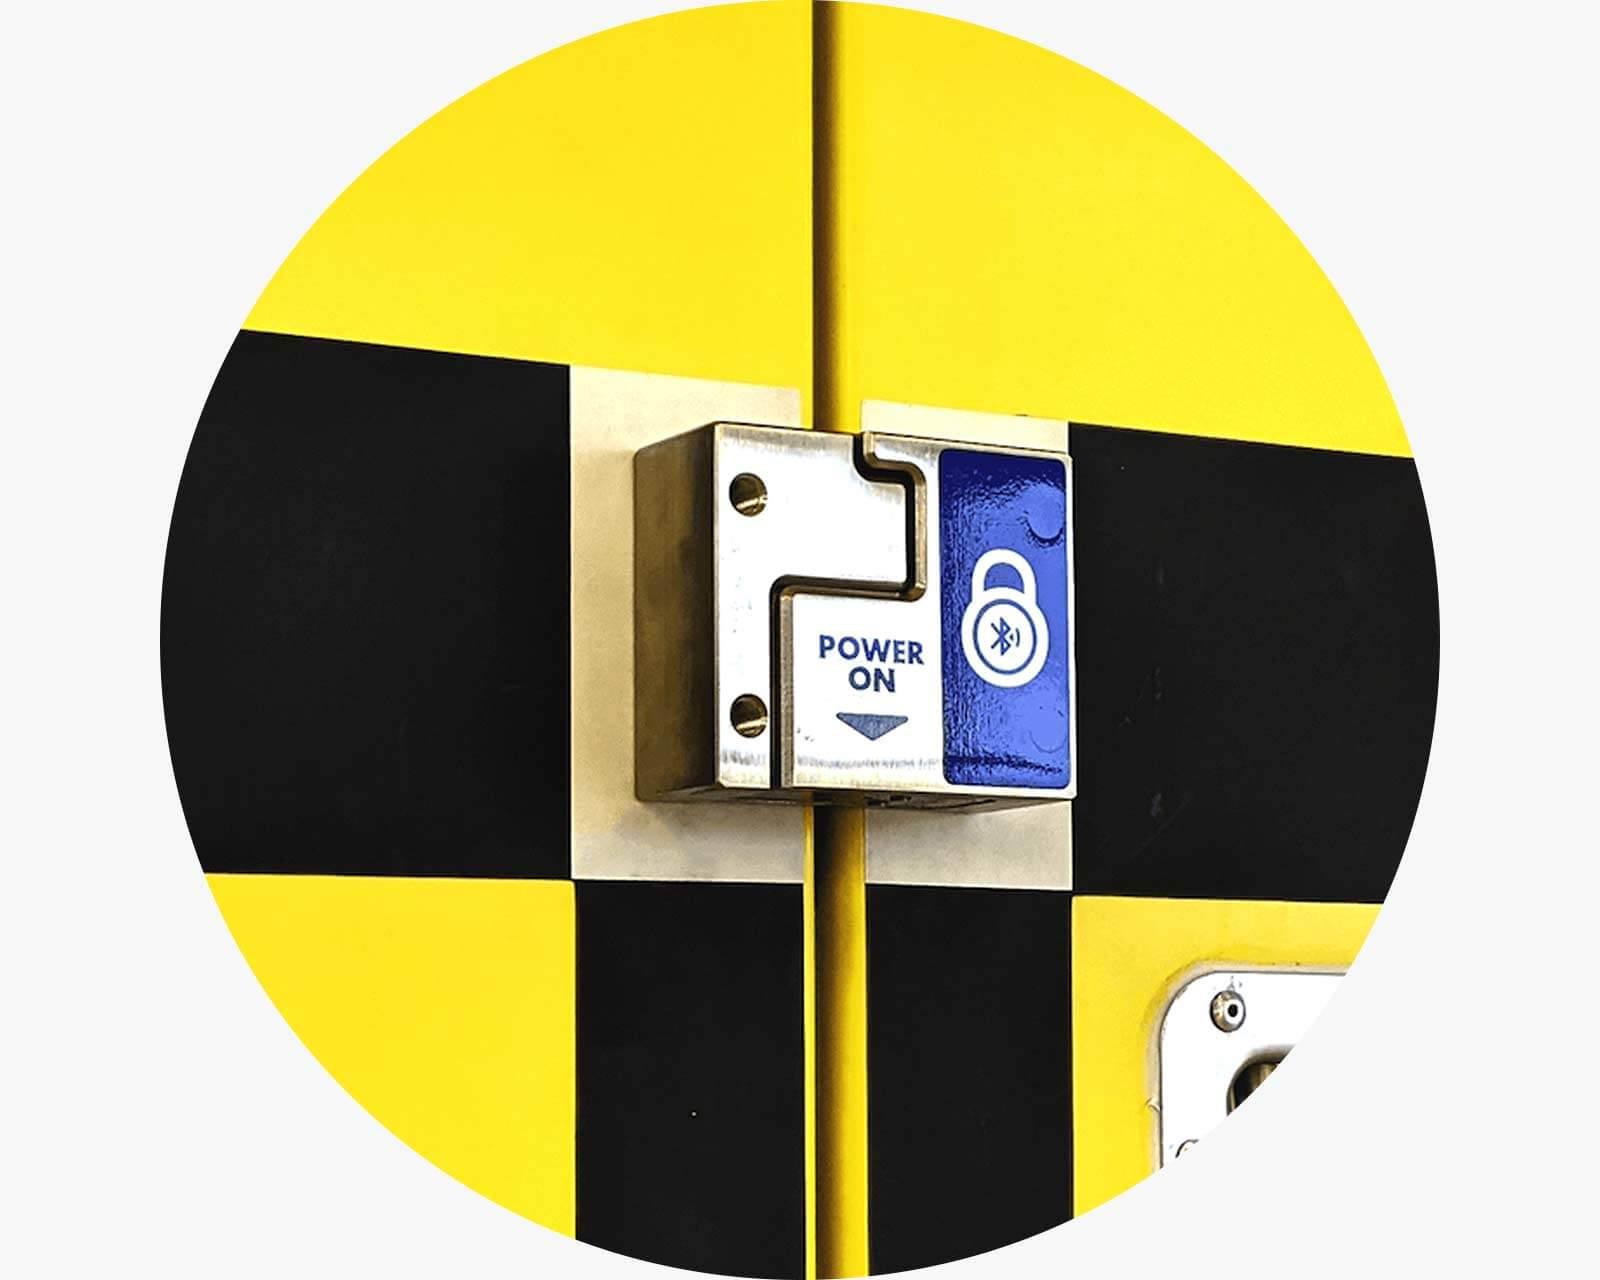 TAXIBOX Bluetooth locks